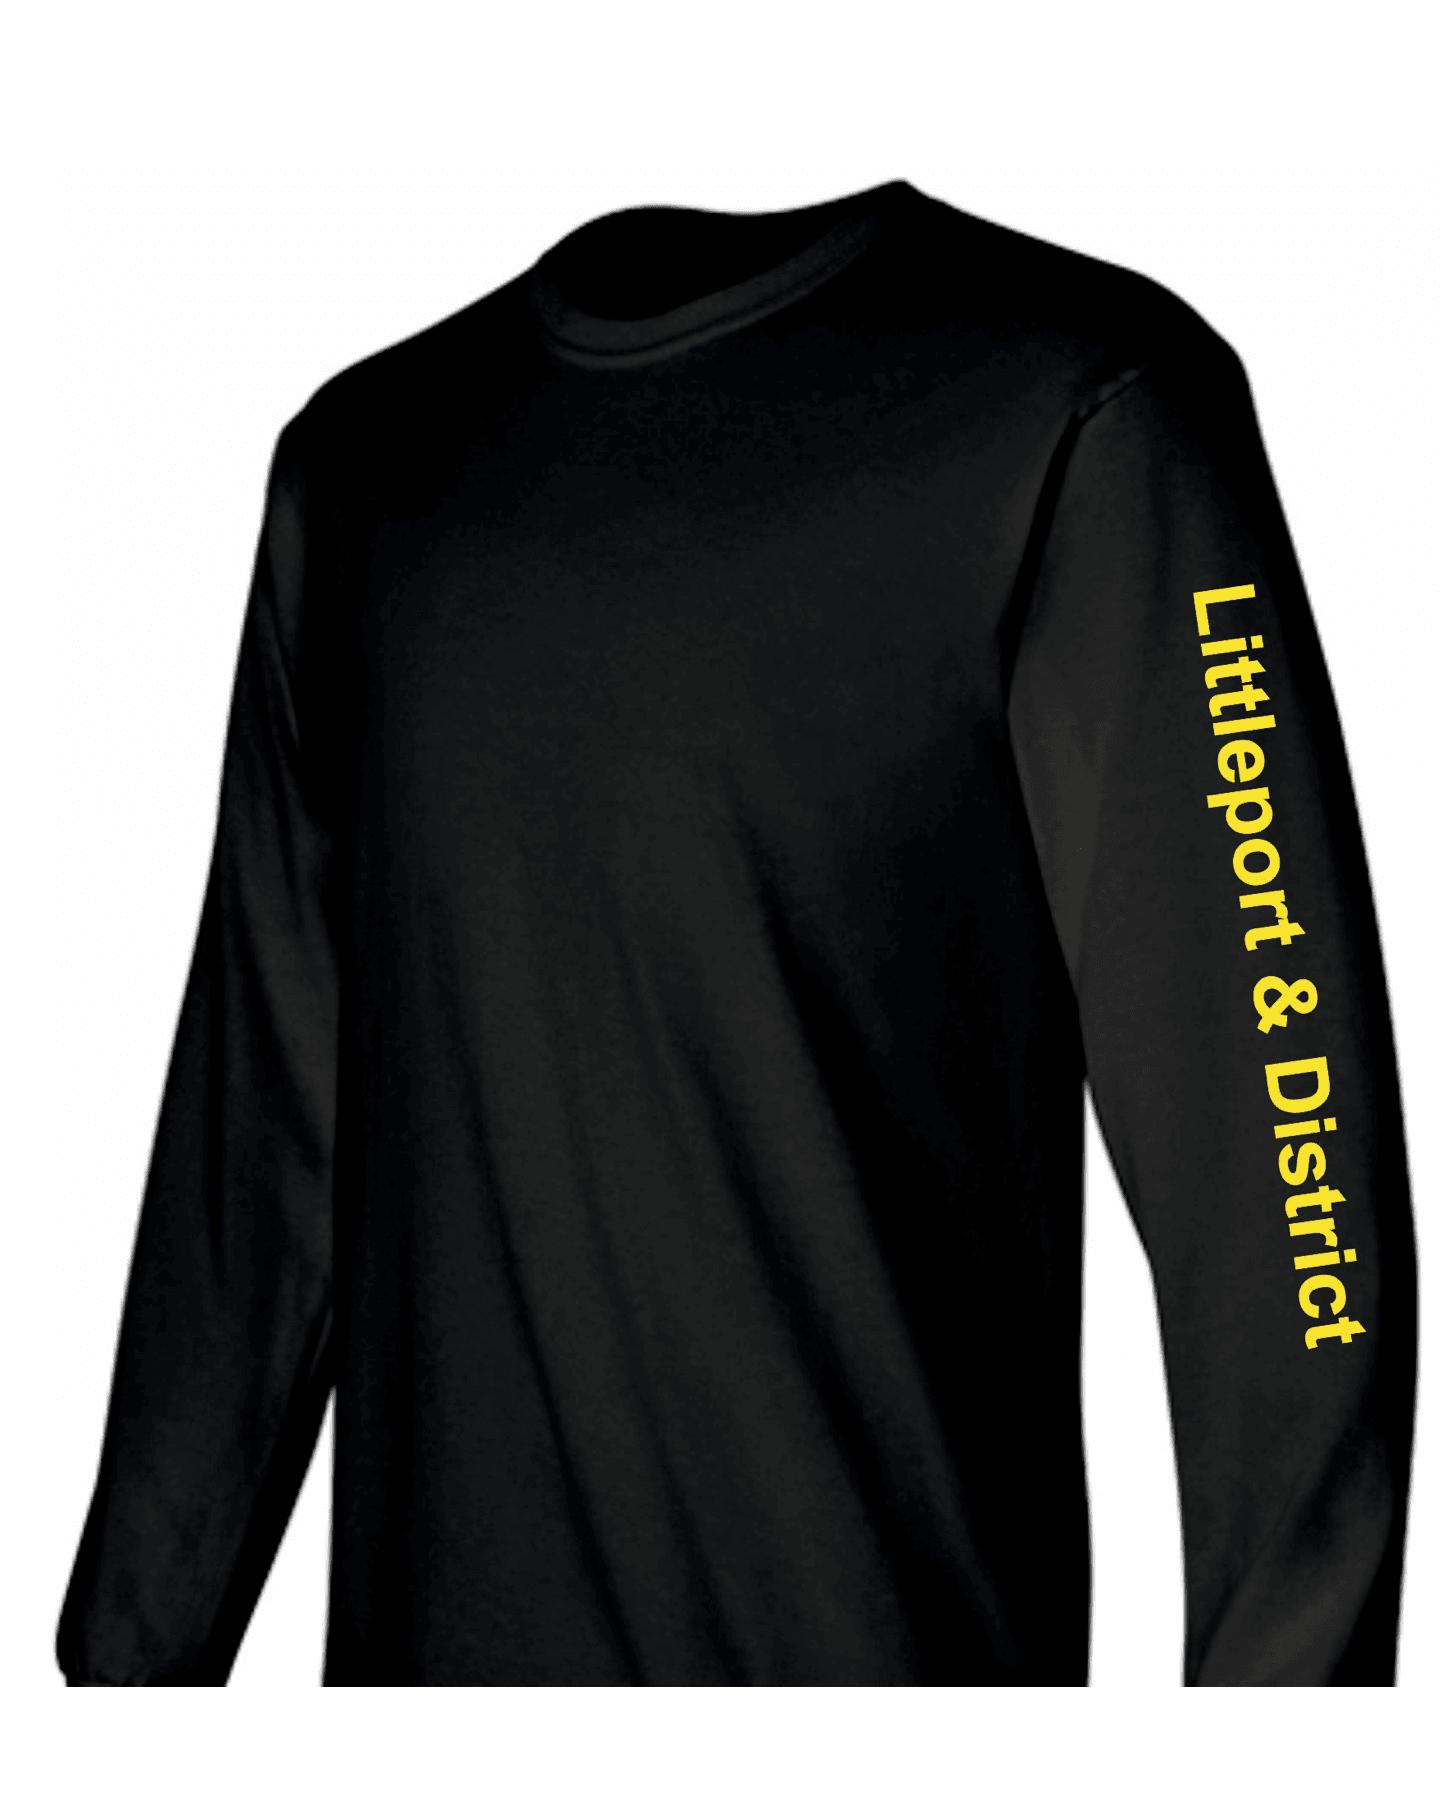 Littleport & District Pony Club – Long Sleeve Tee Unisex